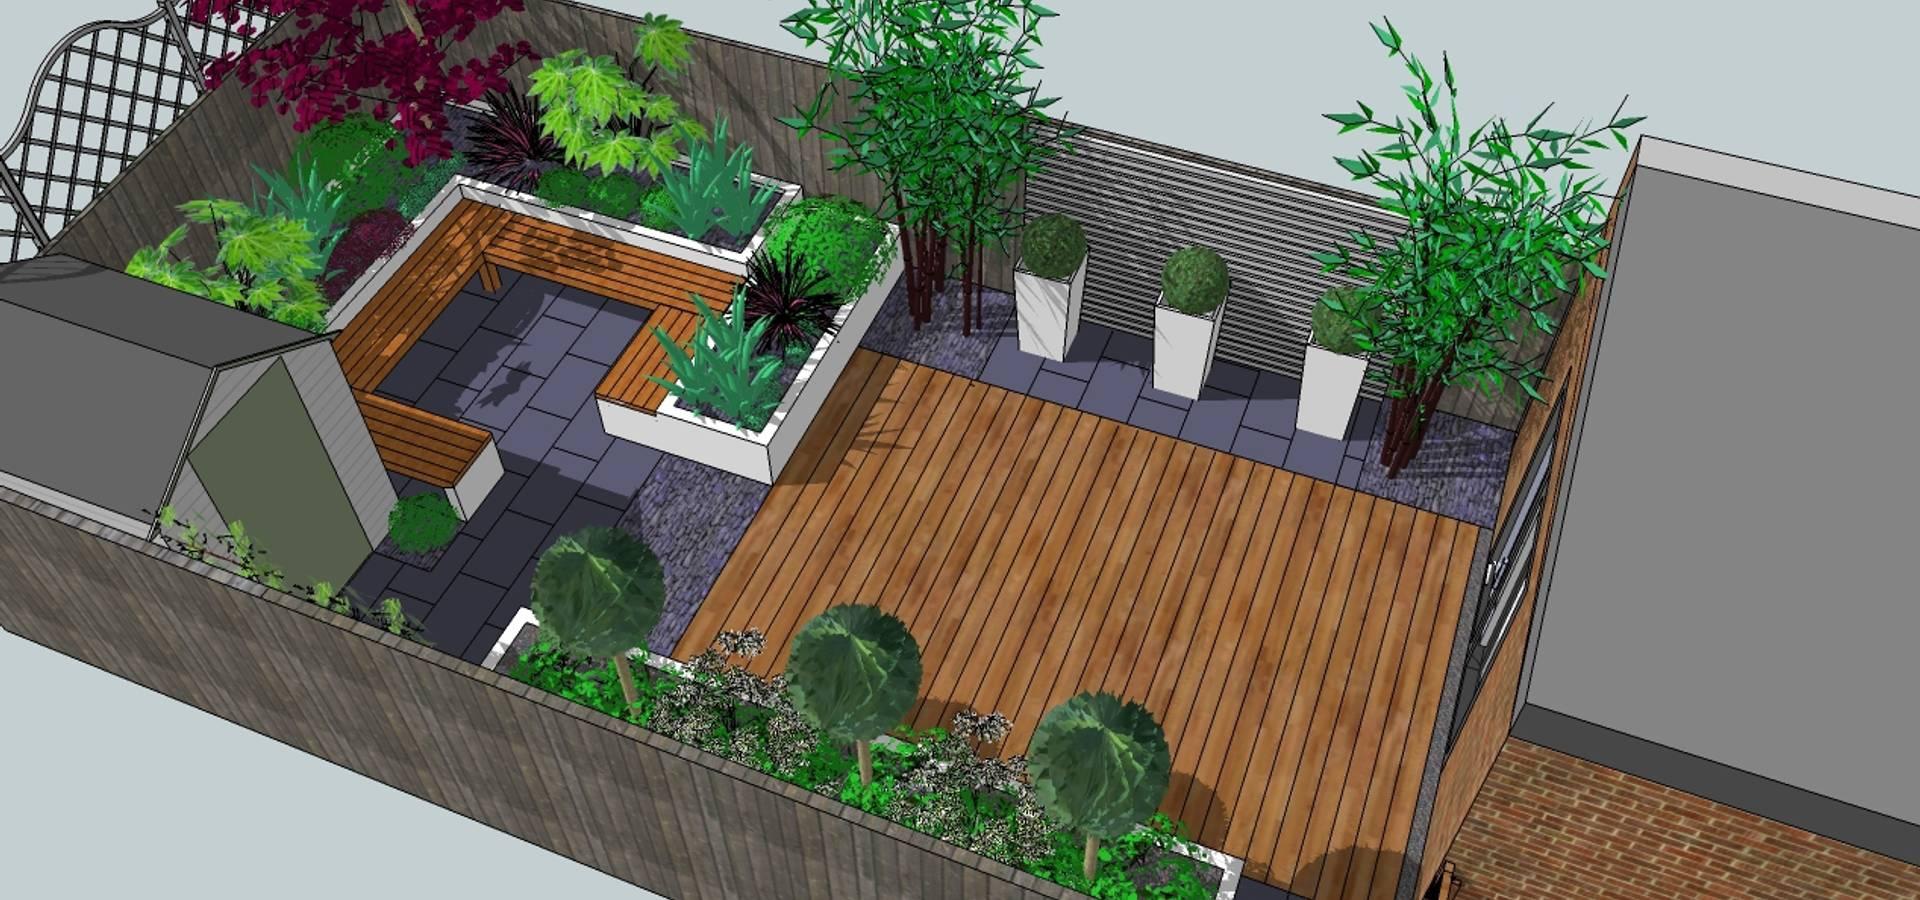 Bea Ray Garden Design Ltd